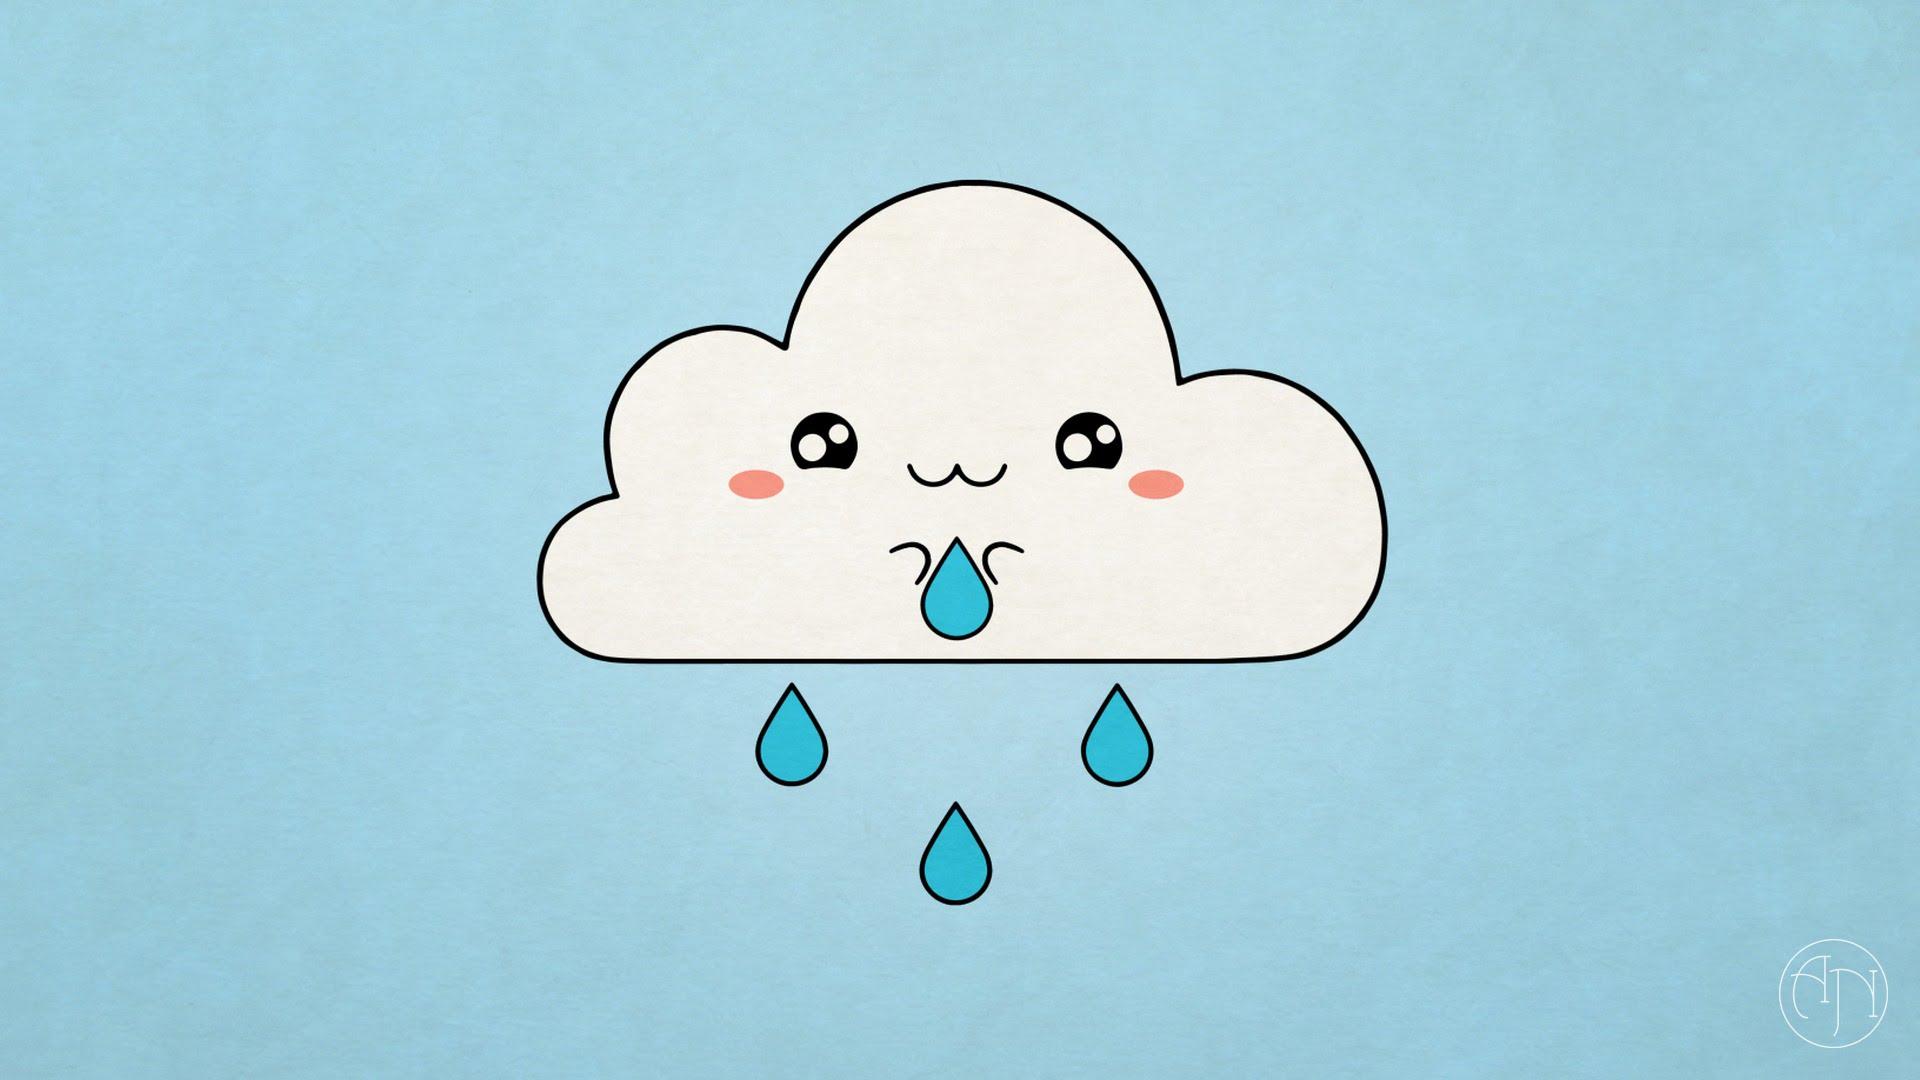 Drawn clouds cute cartoon Draw] A To Cloud To